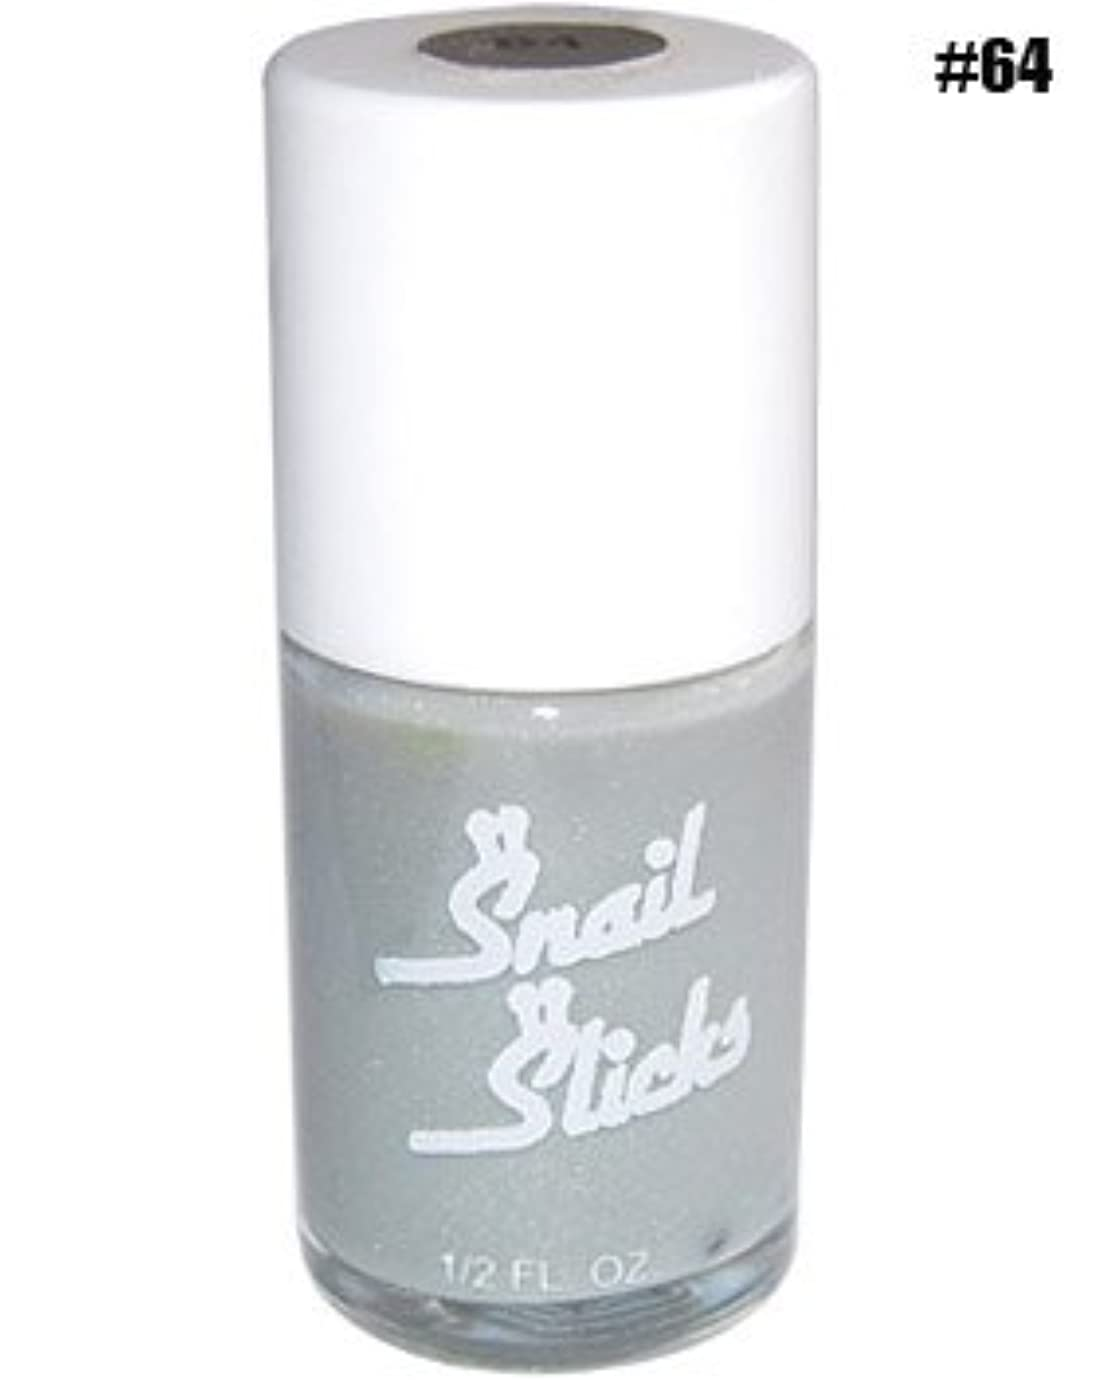 SnailSlicks ネイルラッカー #64